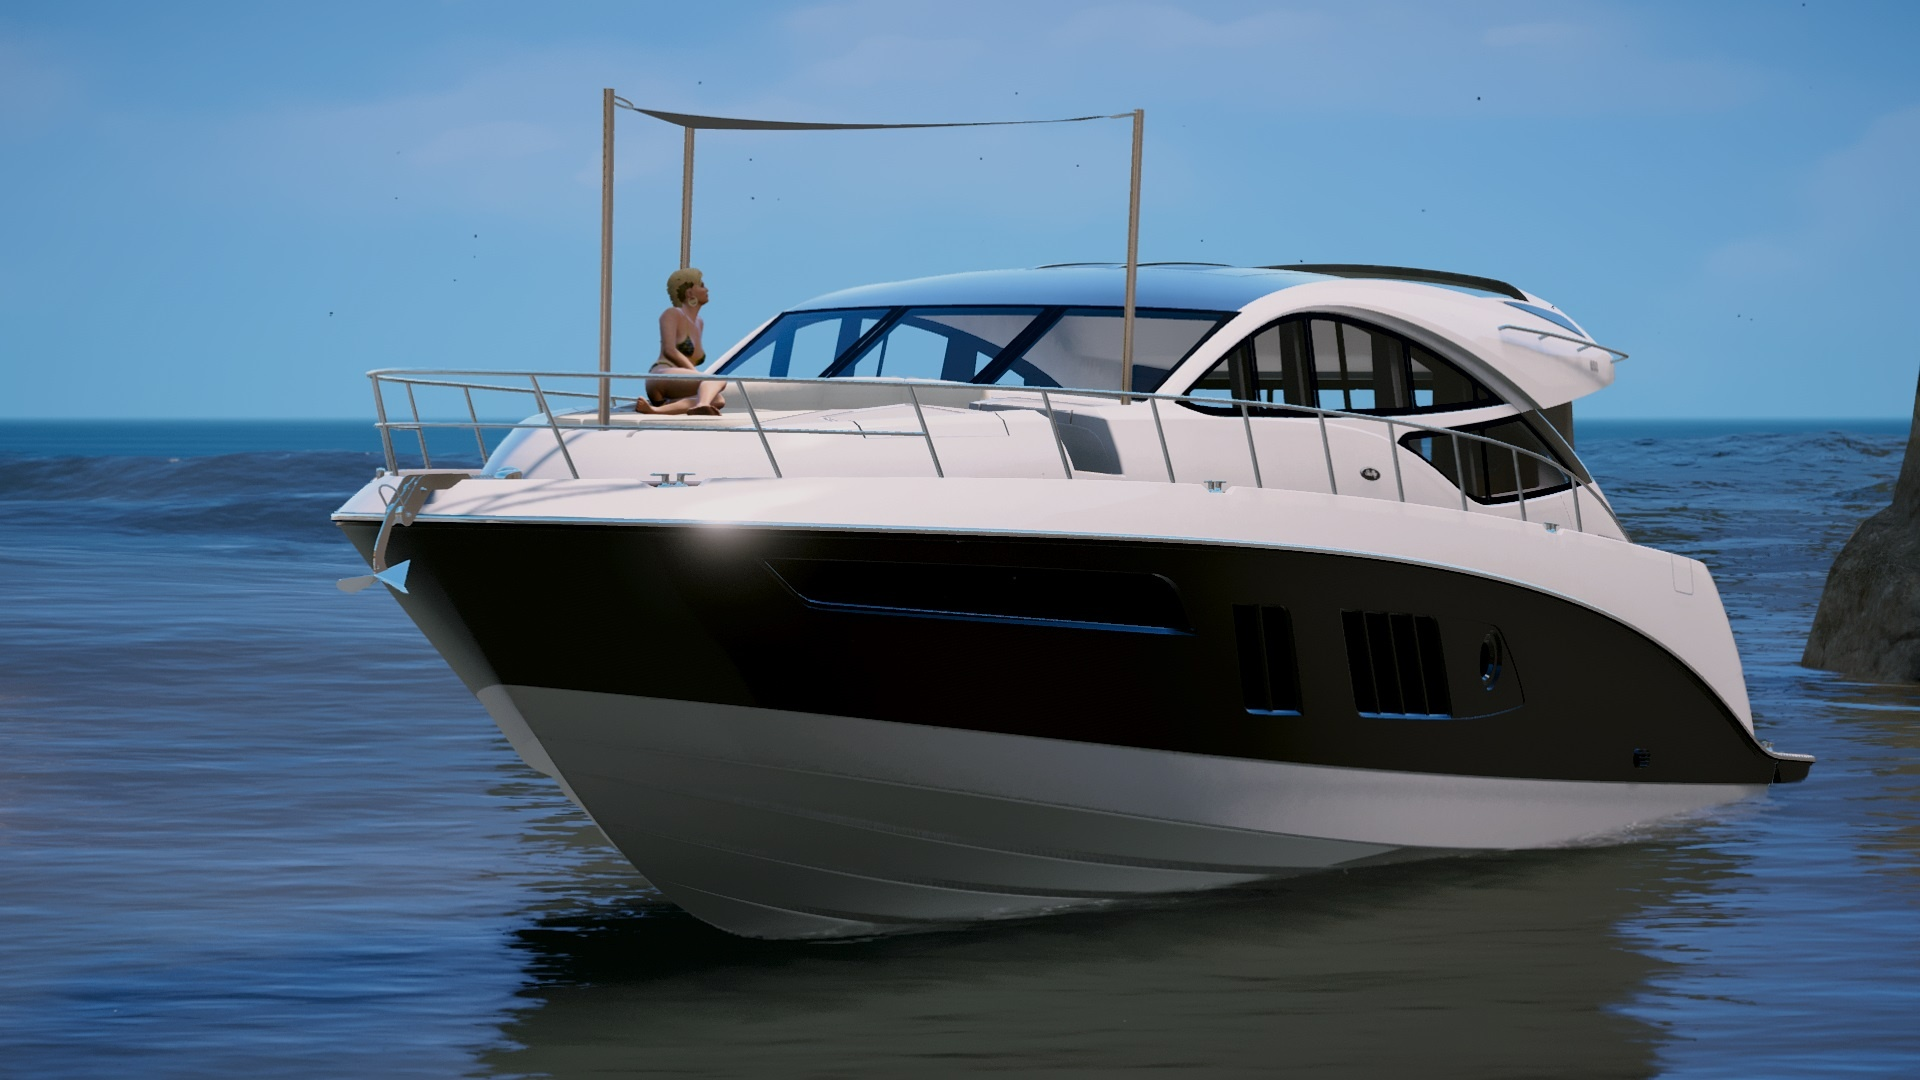 Latest GTA 5 Mods - Boat - GTA5-Mods.com